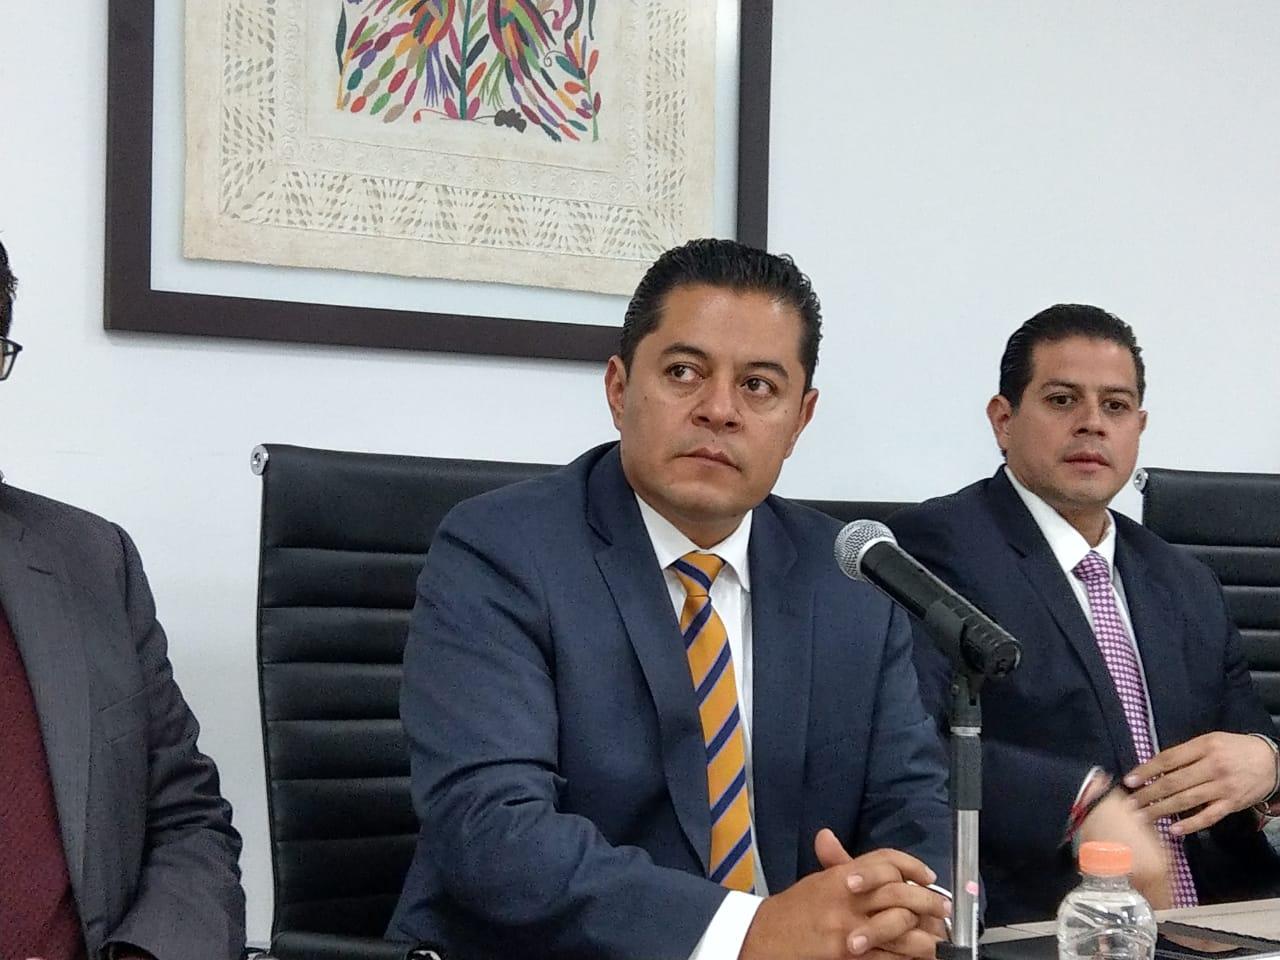 IEE amplia plazo para entrega de firmas de respaldo a candidaturas independientes